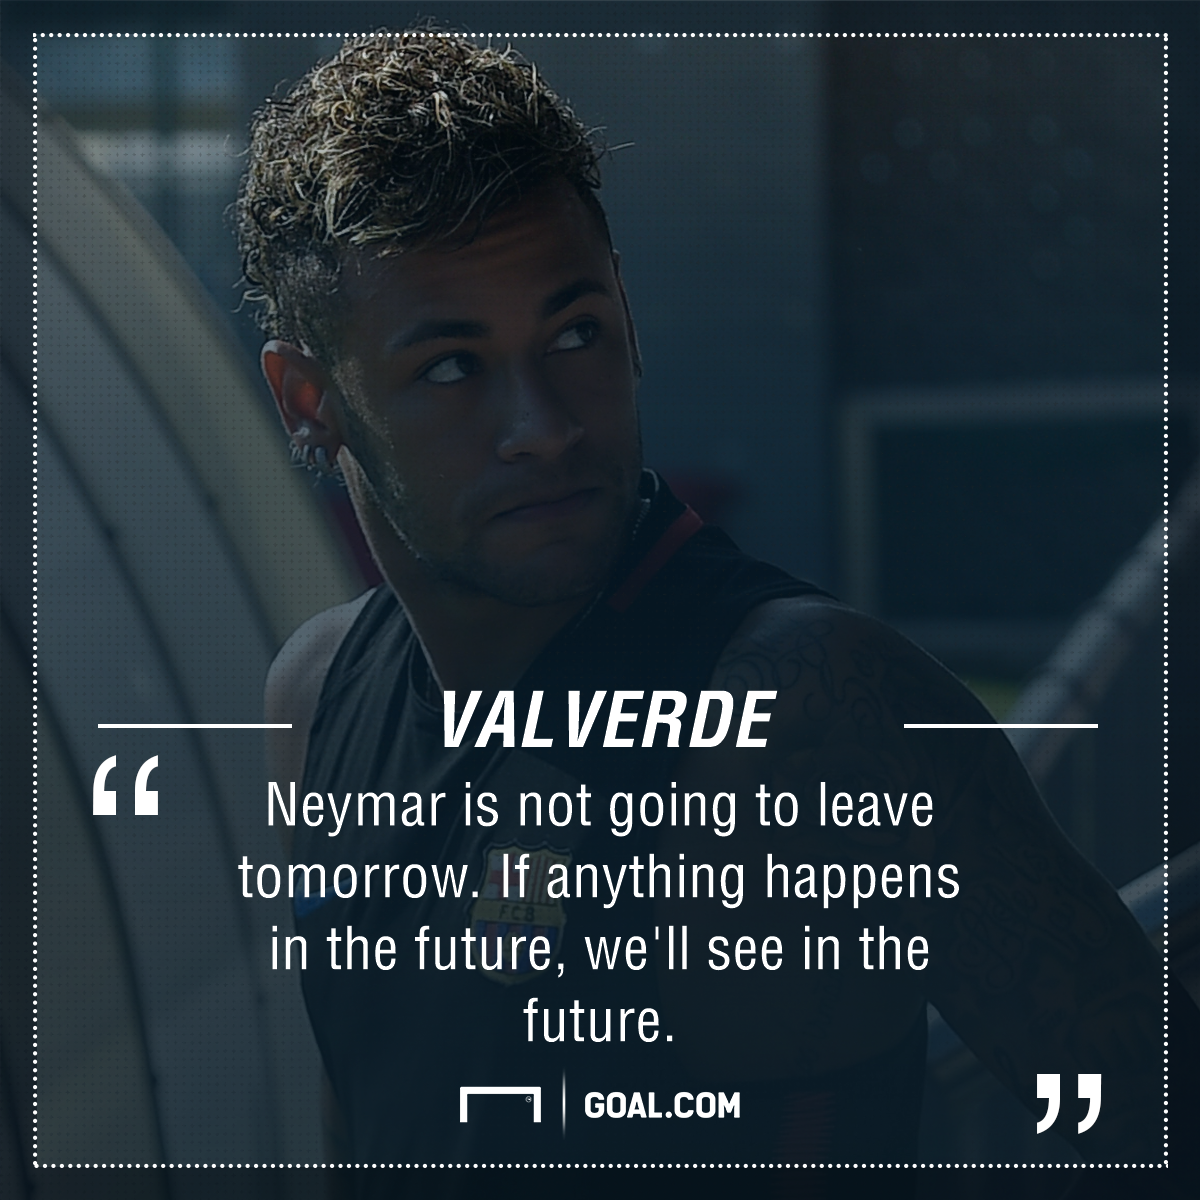 Valverde quote